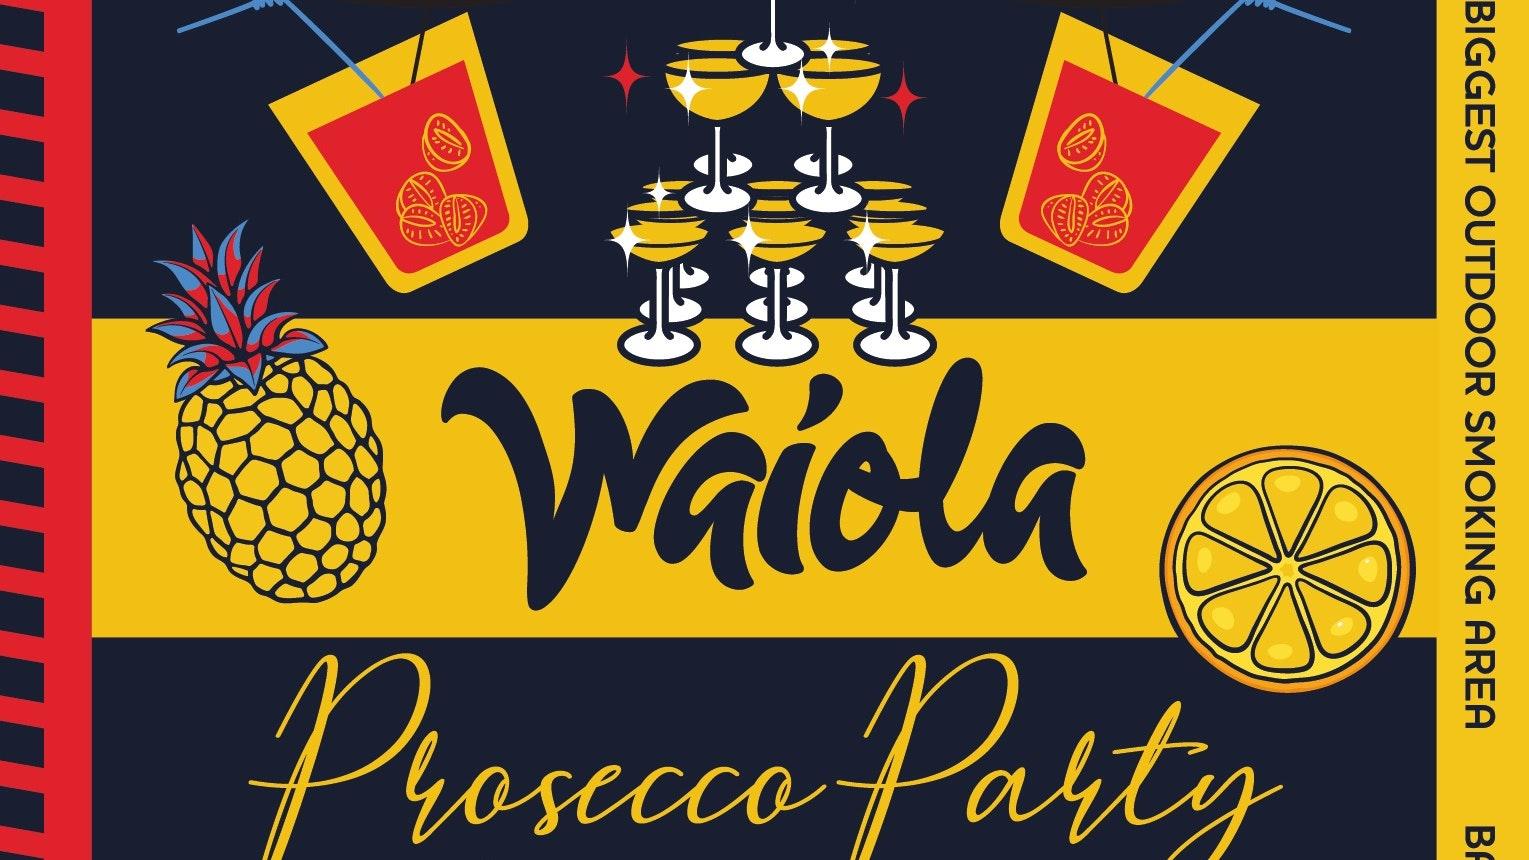 Waiola – Prosecco Party